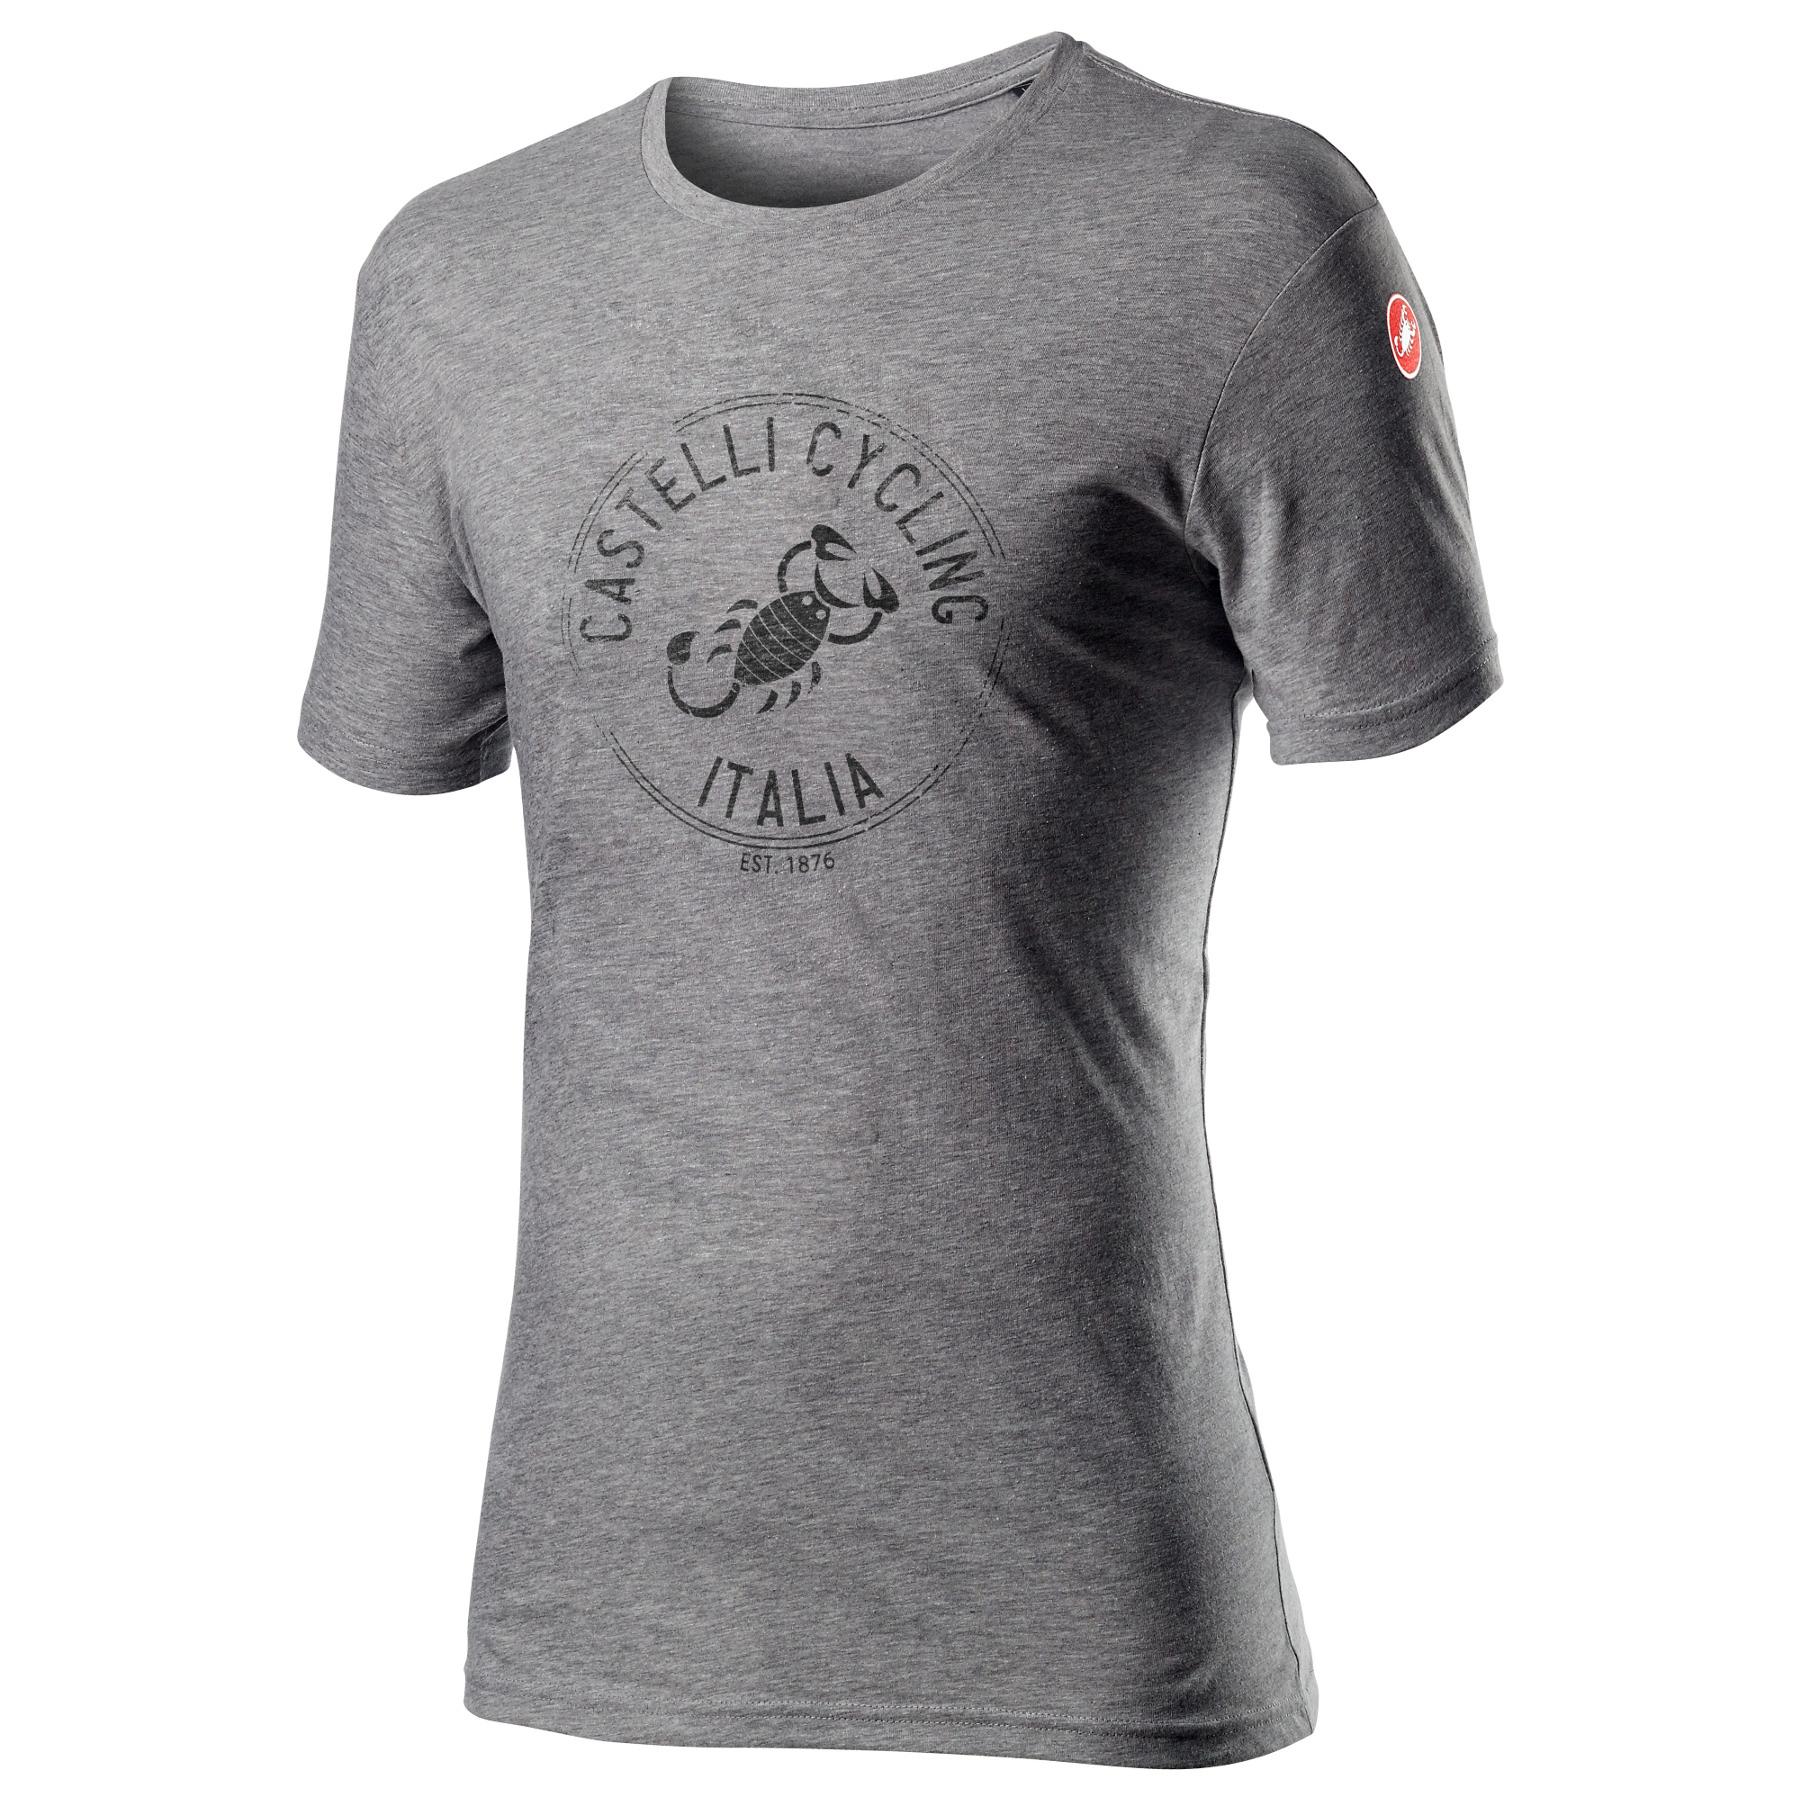 Castelli Armando T-Shirt - melange vortex grey 860